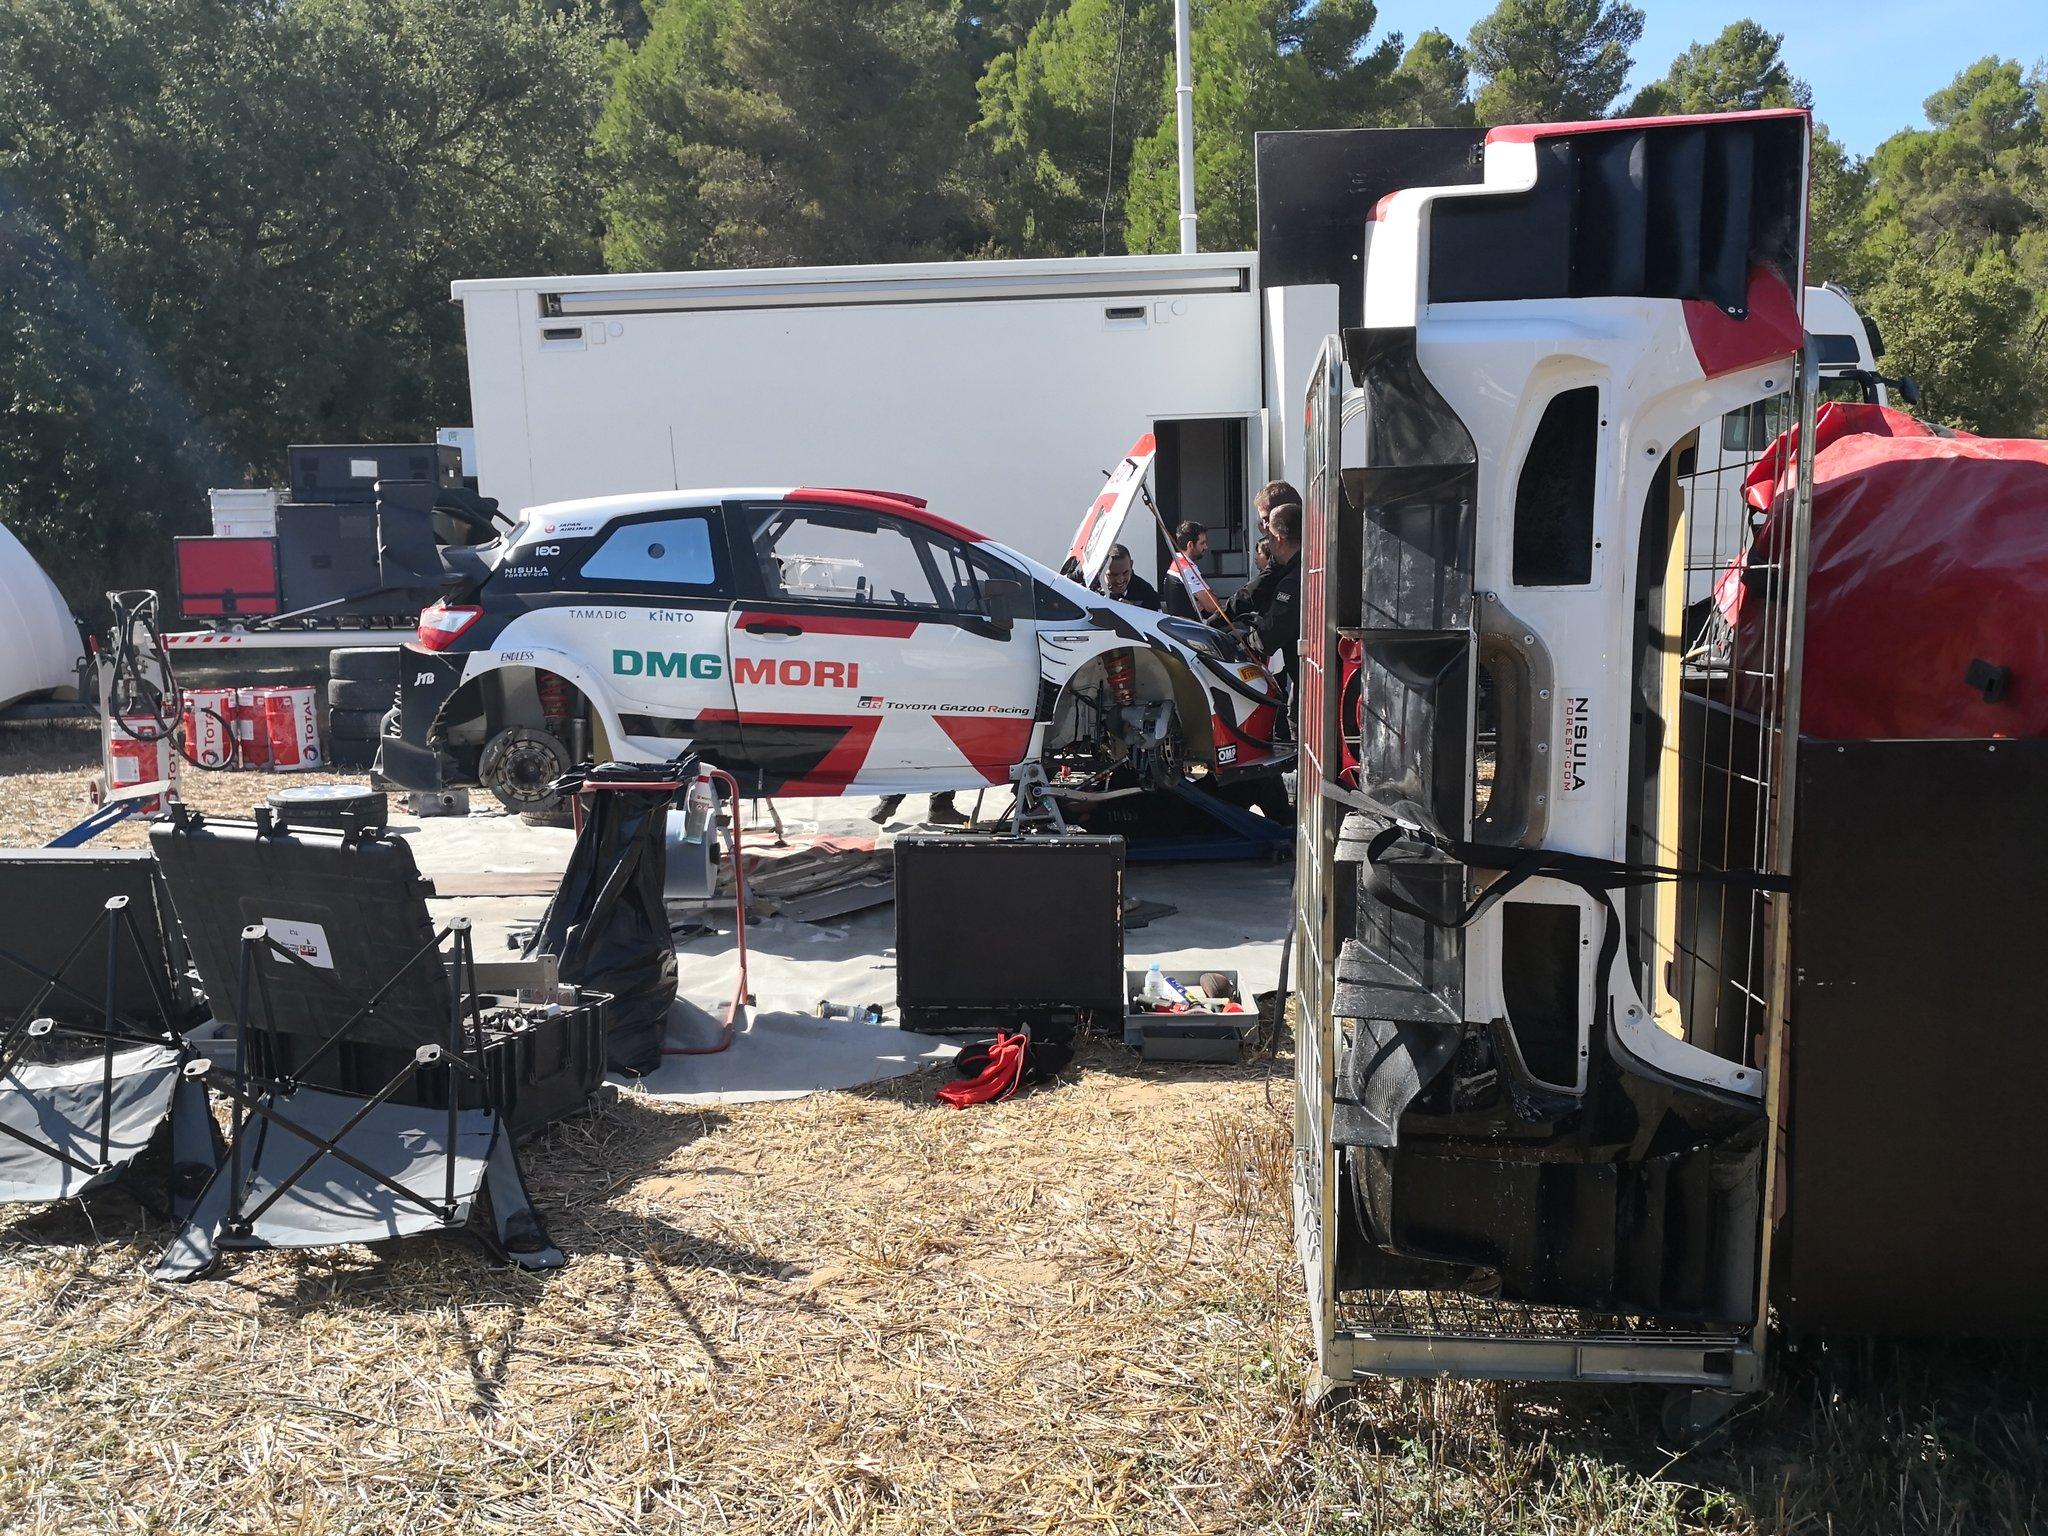 World Rally Championship: Temporada 2021  - Página 37 FA8EgHRWQAAHuQa?format=jpg&name=large